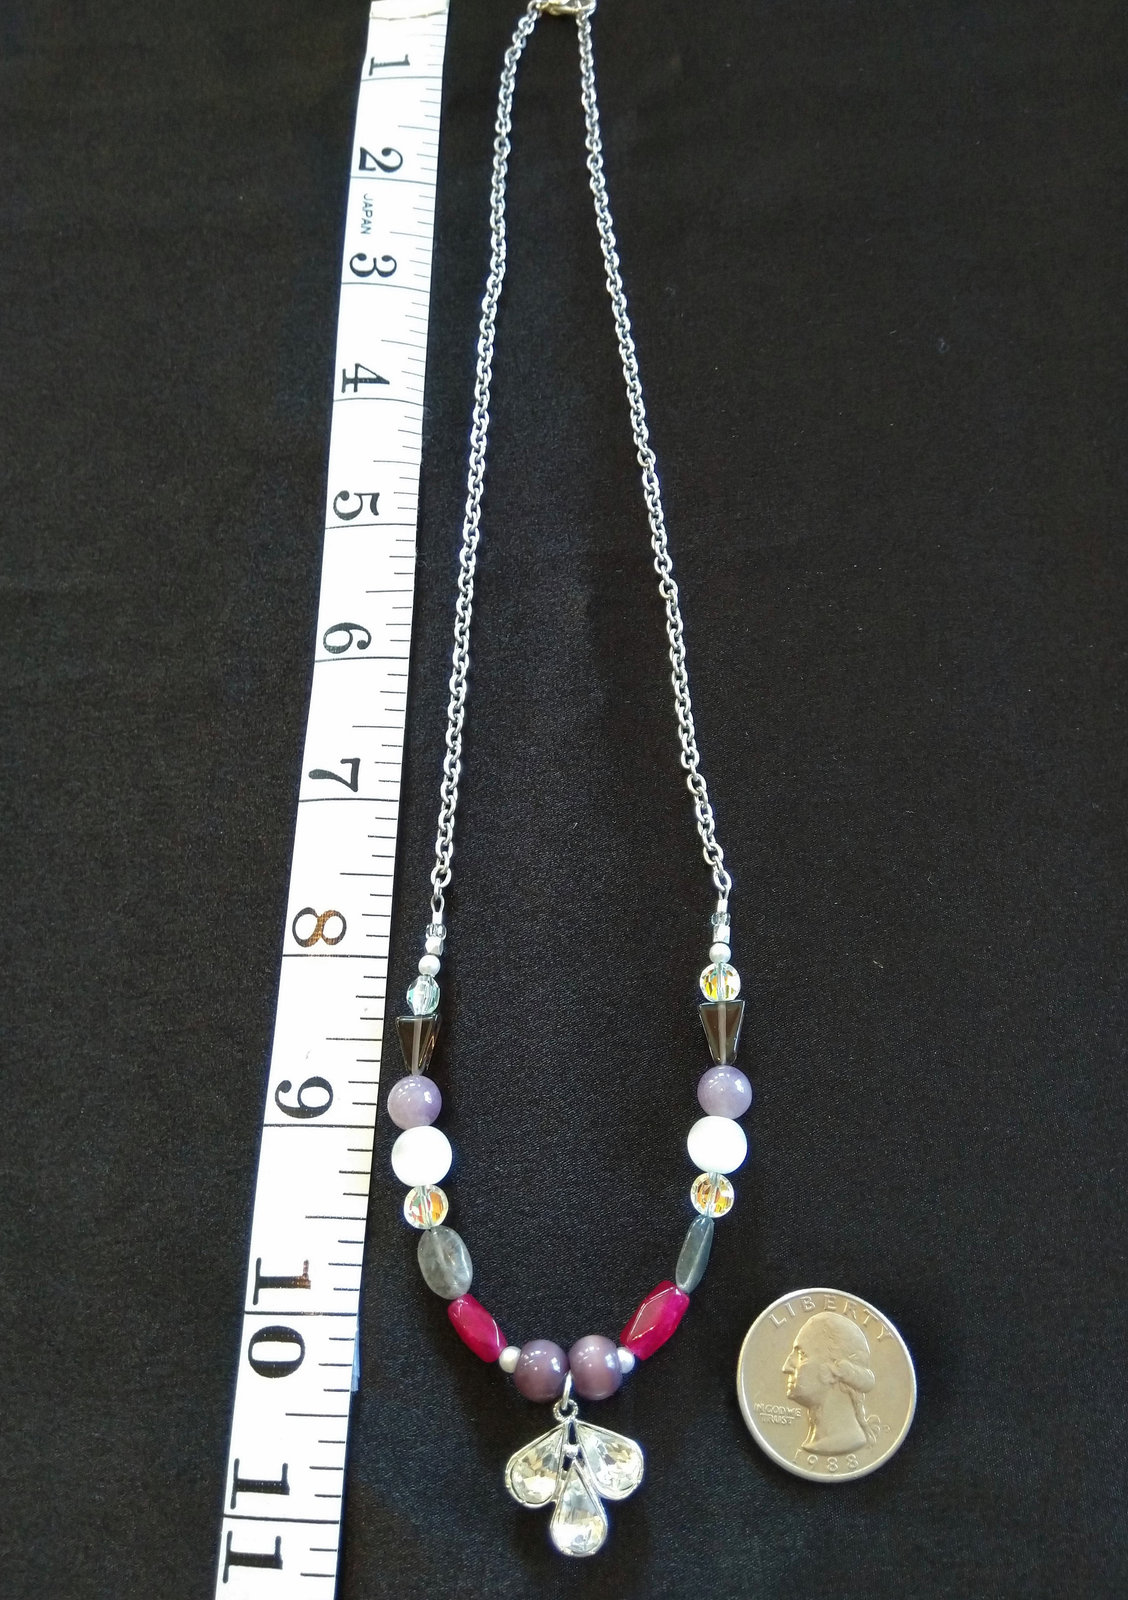 Crown Chakra Gemstone Necklace with Vintage Glass Gem Piece